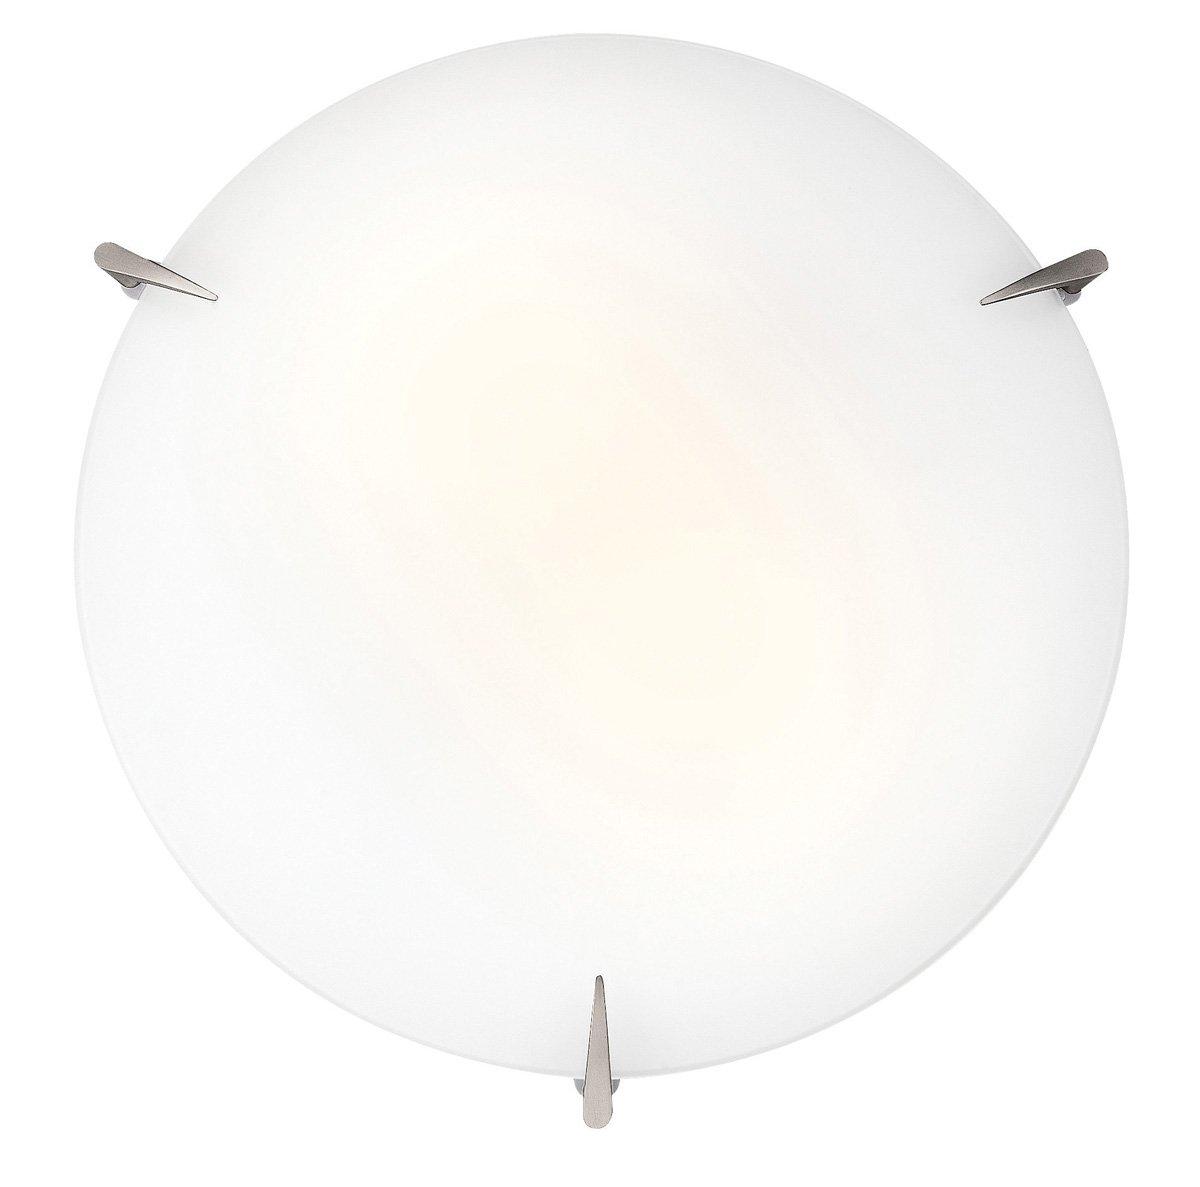 Zenon - LED Light 16''dia Flush Mount - Brushed Steel Finish - Opal Glass Shade